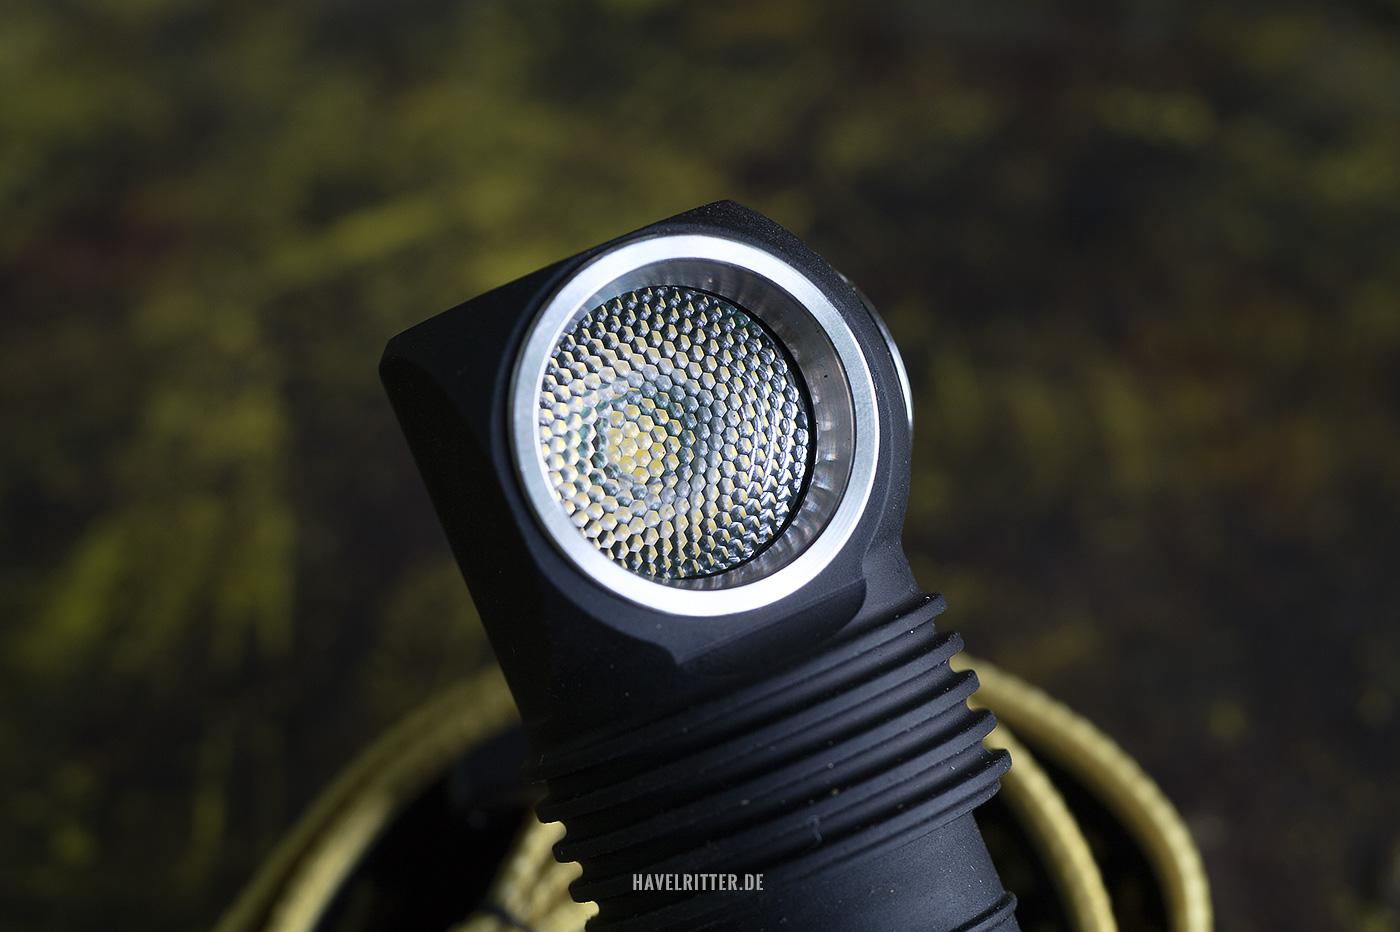 Armytek Wizard Pro - TIP Linse und Optik